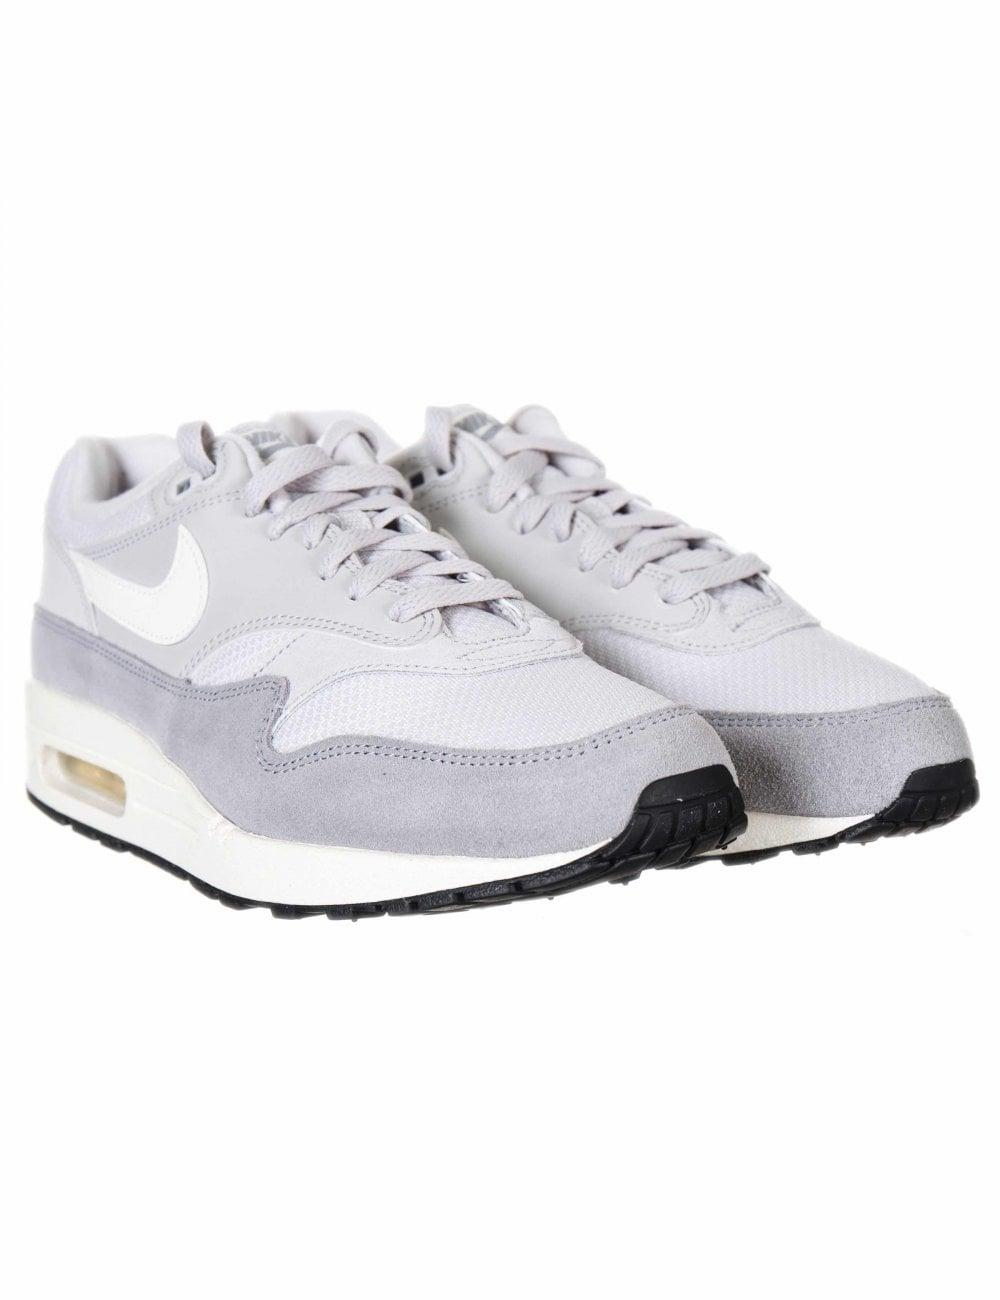 b2c39c2a14ec Nike Air Max 1 Trainers - Vast Grey Sail - Footwear from Fat Buddha ...